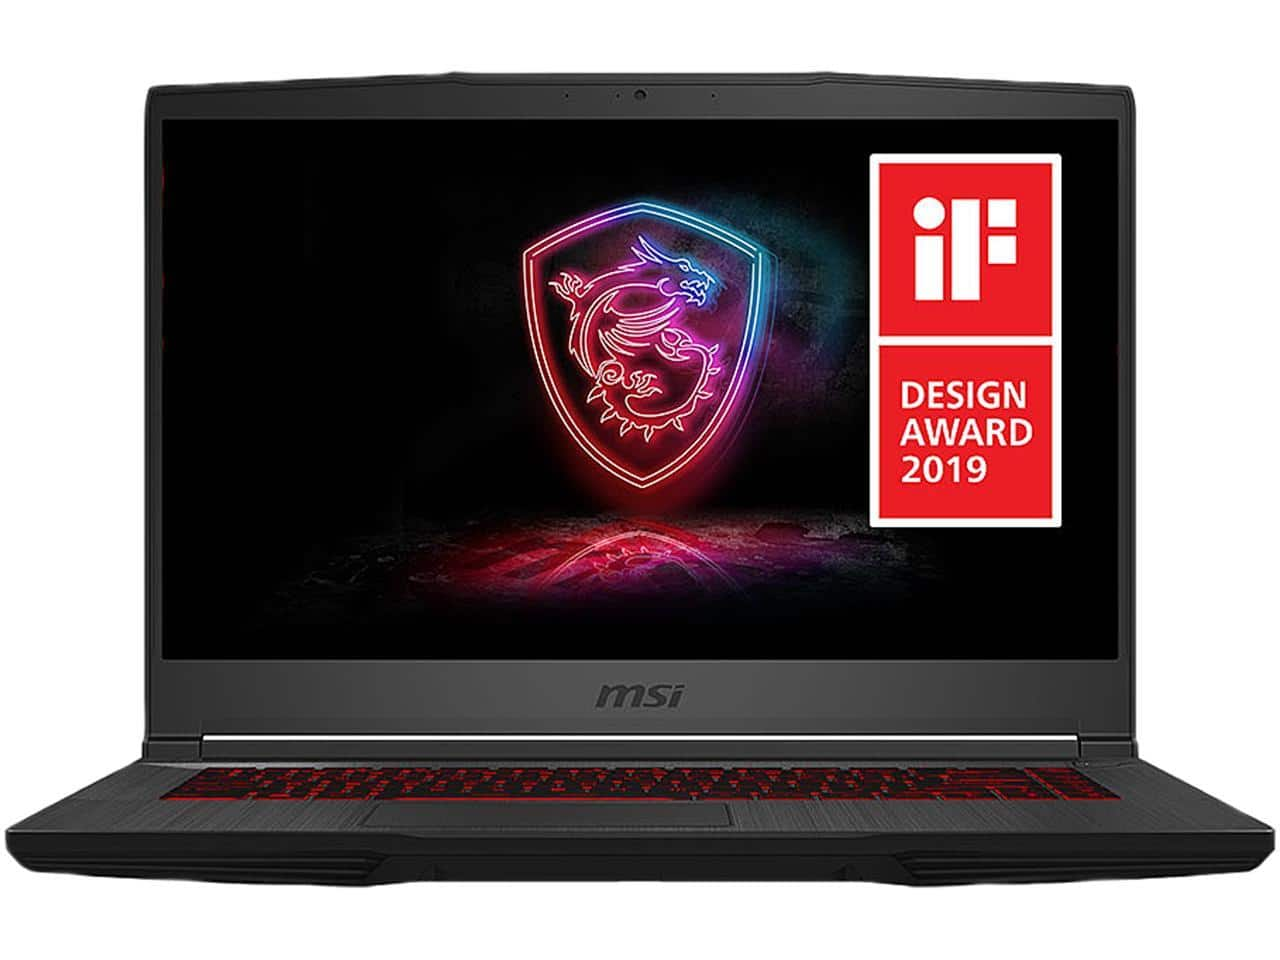 "MSI GF65 Thin 9SEXR-839 - 15.6"" 144 Hz - Intel Core i5-9300H - GeForce RTX 2060 - 8 GB DDR4 - 512 GB SSD for $799+F/S"